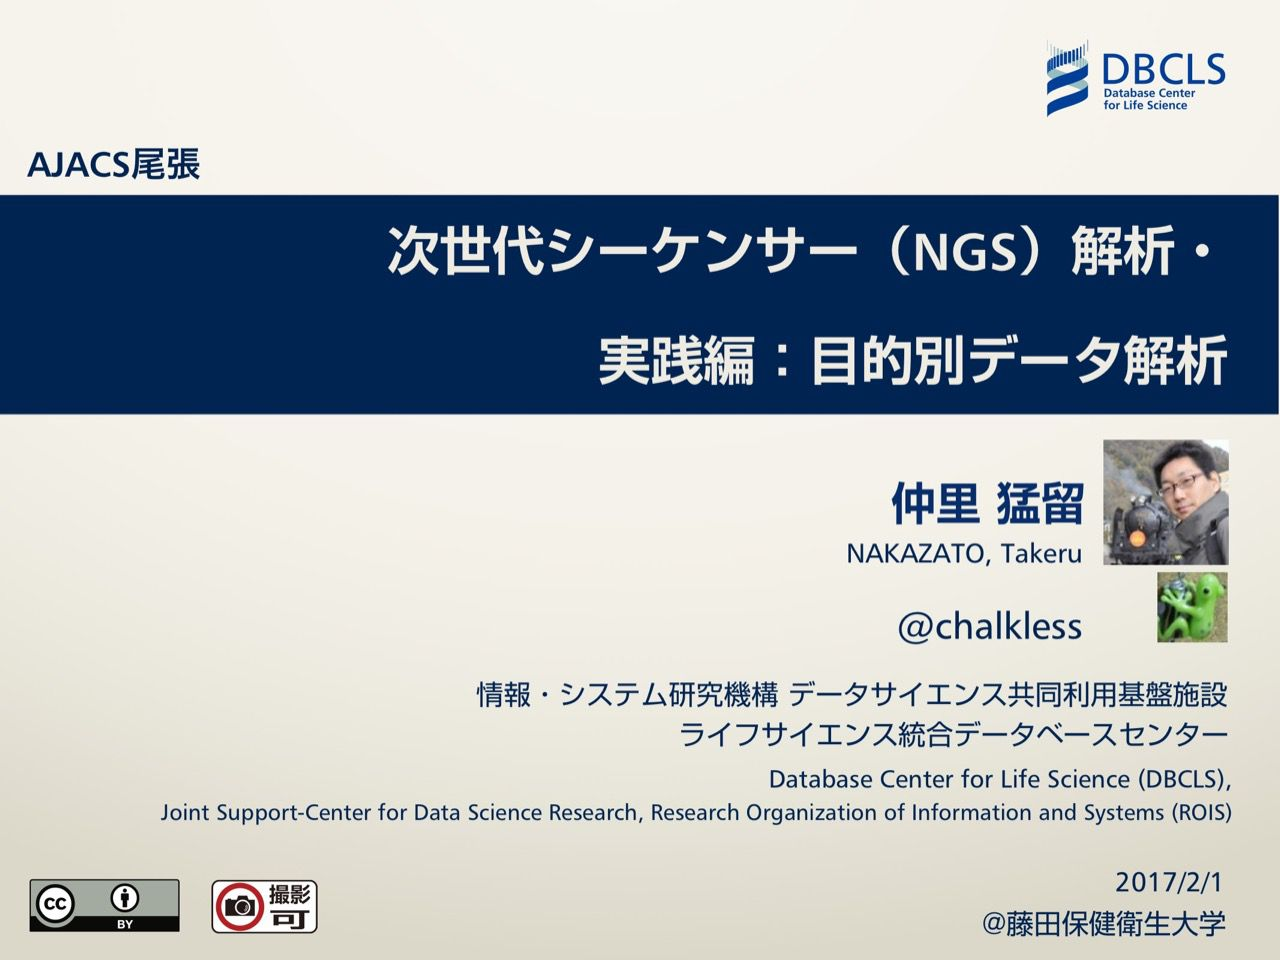 images/AJACS64_04_nakazato_001.jpg